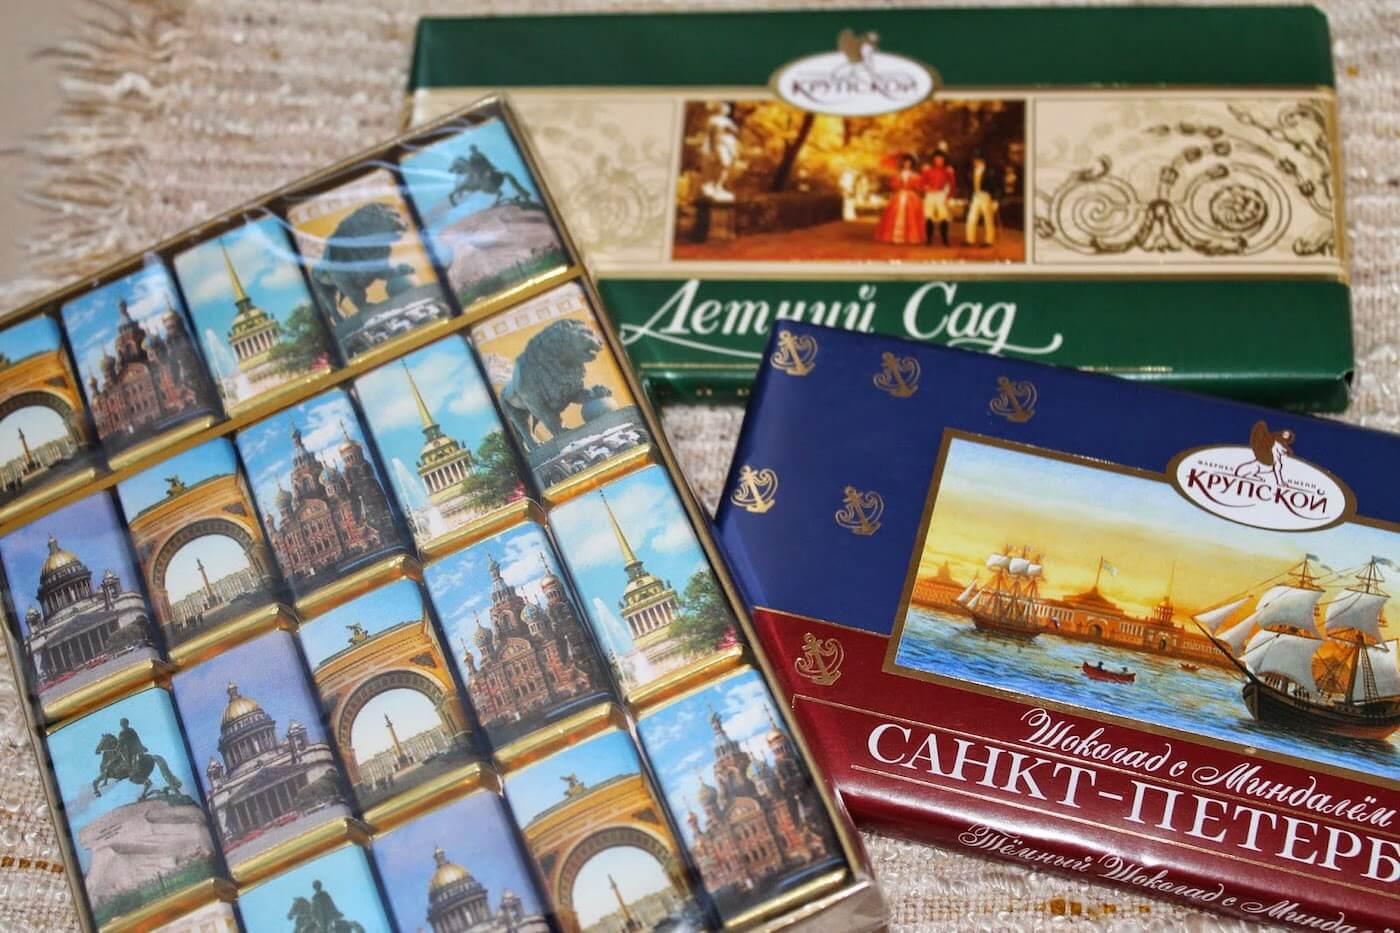 Шоколад фабрики им. Крупской, Санкт-Петербург